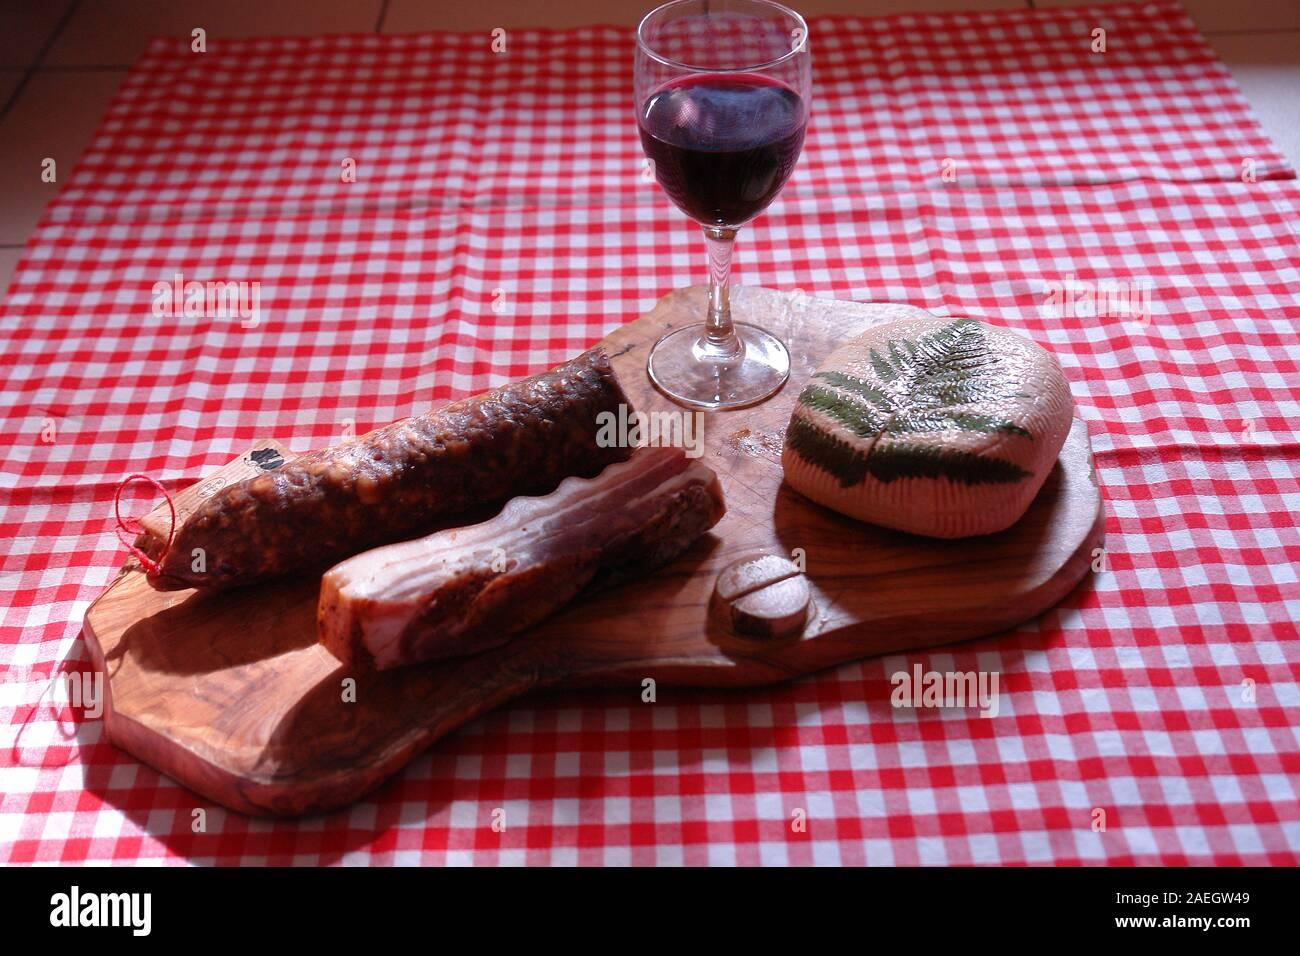 Corsican Sausage High Resolution Stock Photography And Images Alamy